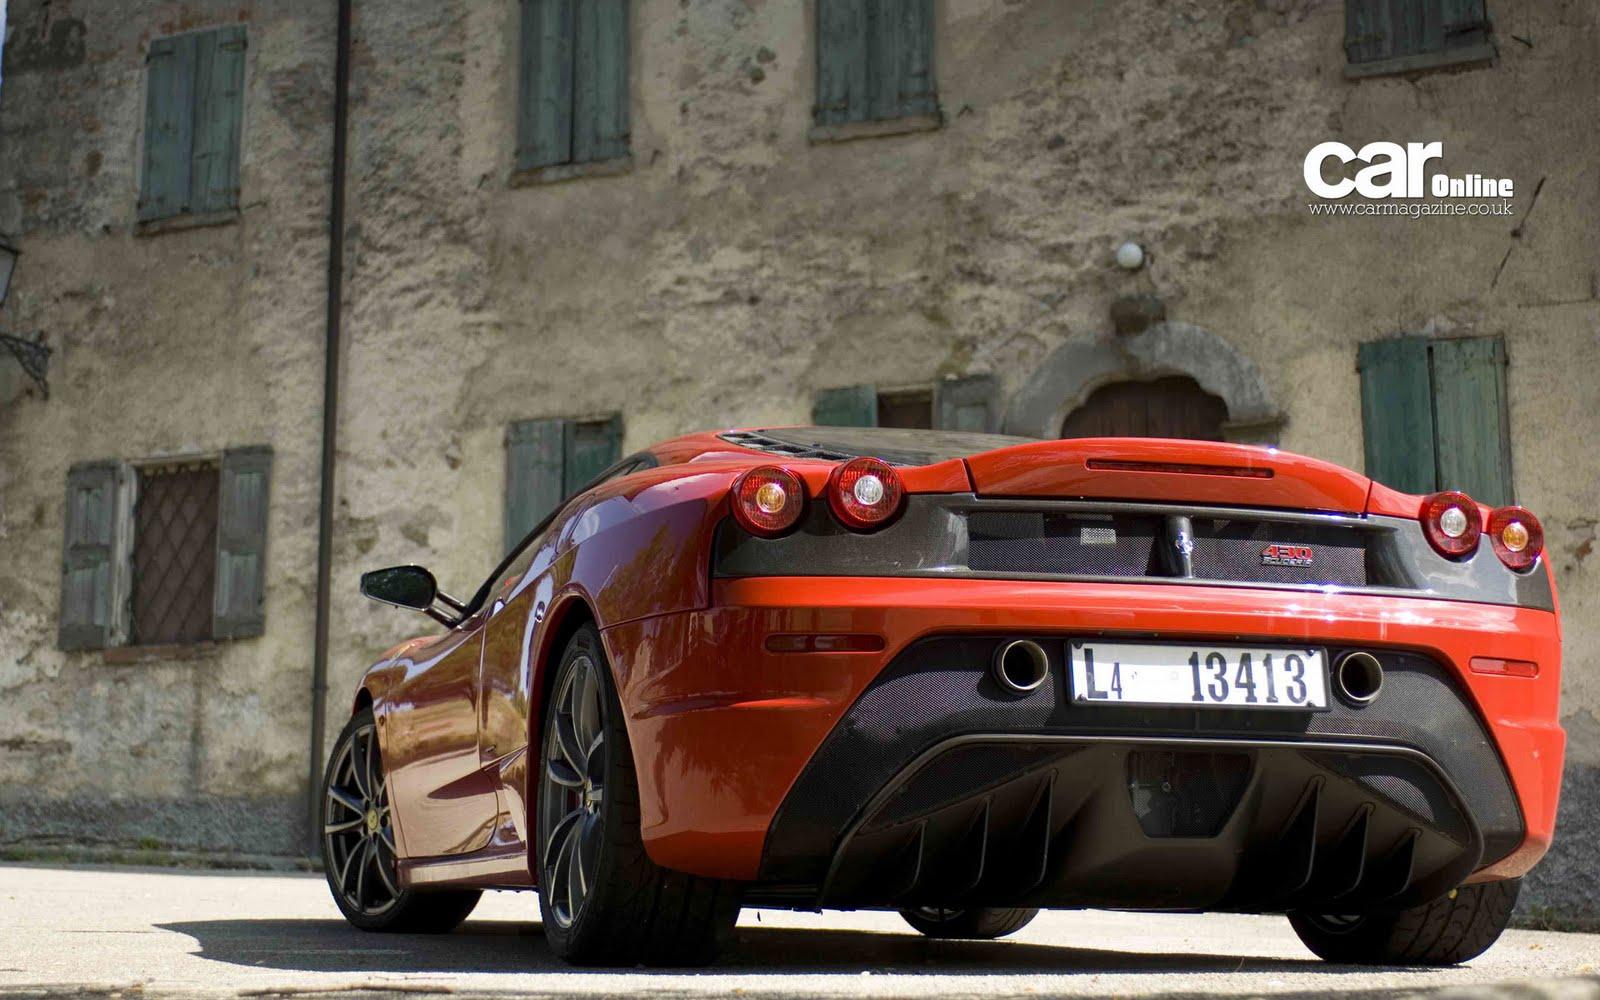 Fast And Furious 7 Cars Wallpapers Hd Ferrari F430 Scuderia Wallpaper Cars Wallpapers And